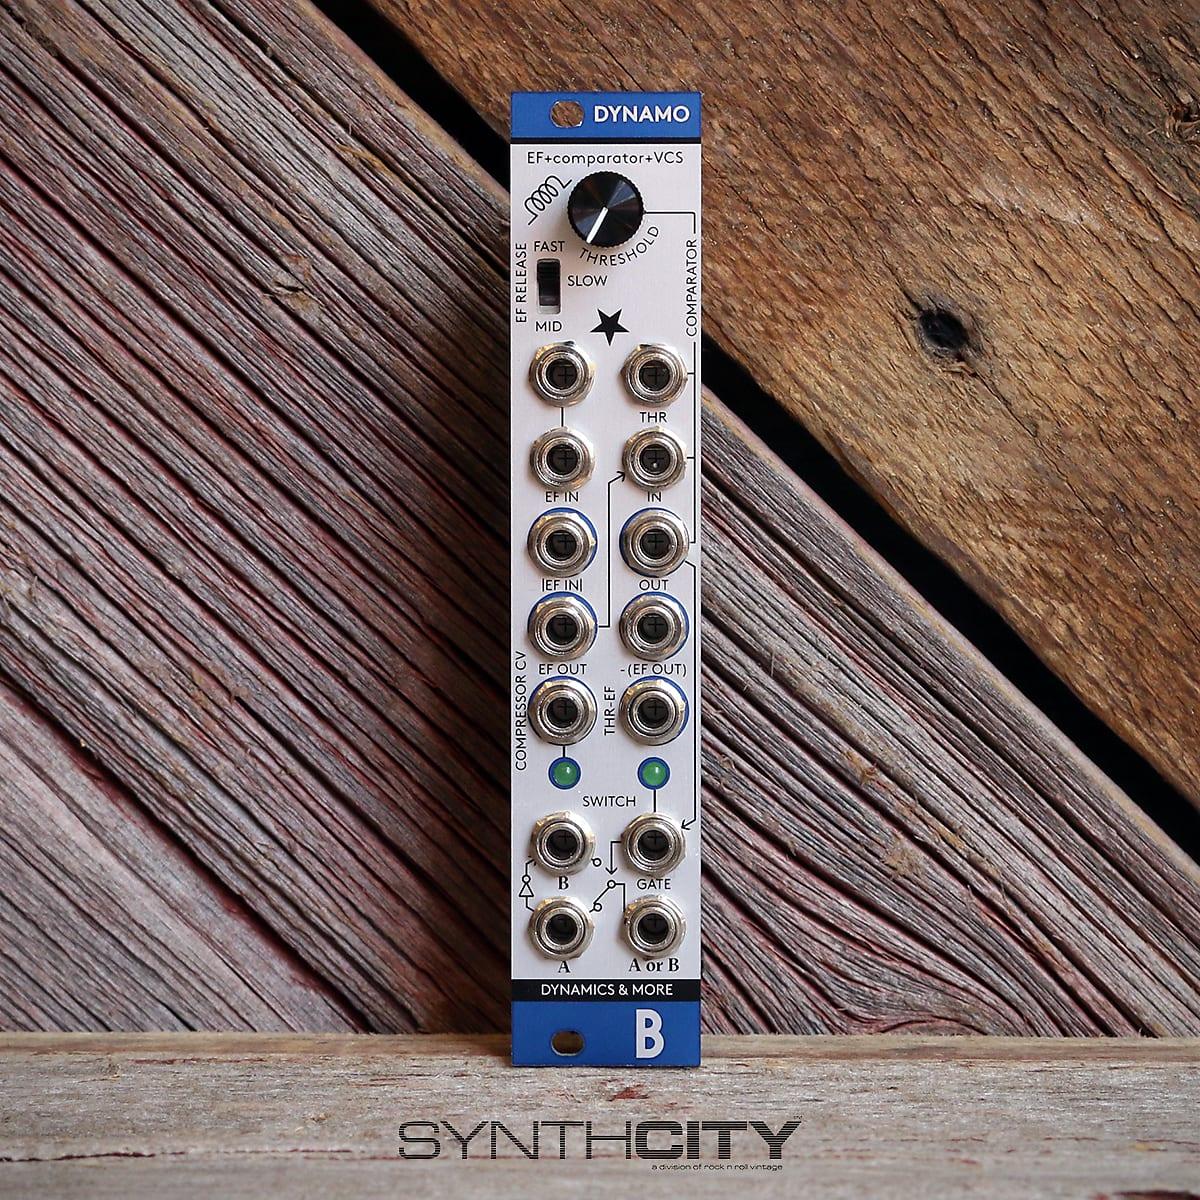 BASTL Instruments Dynamo